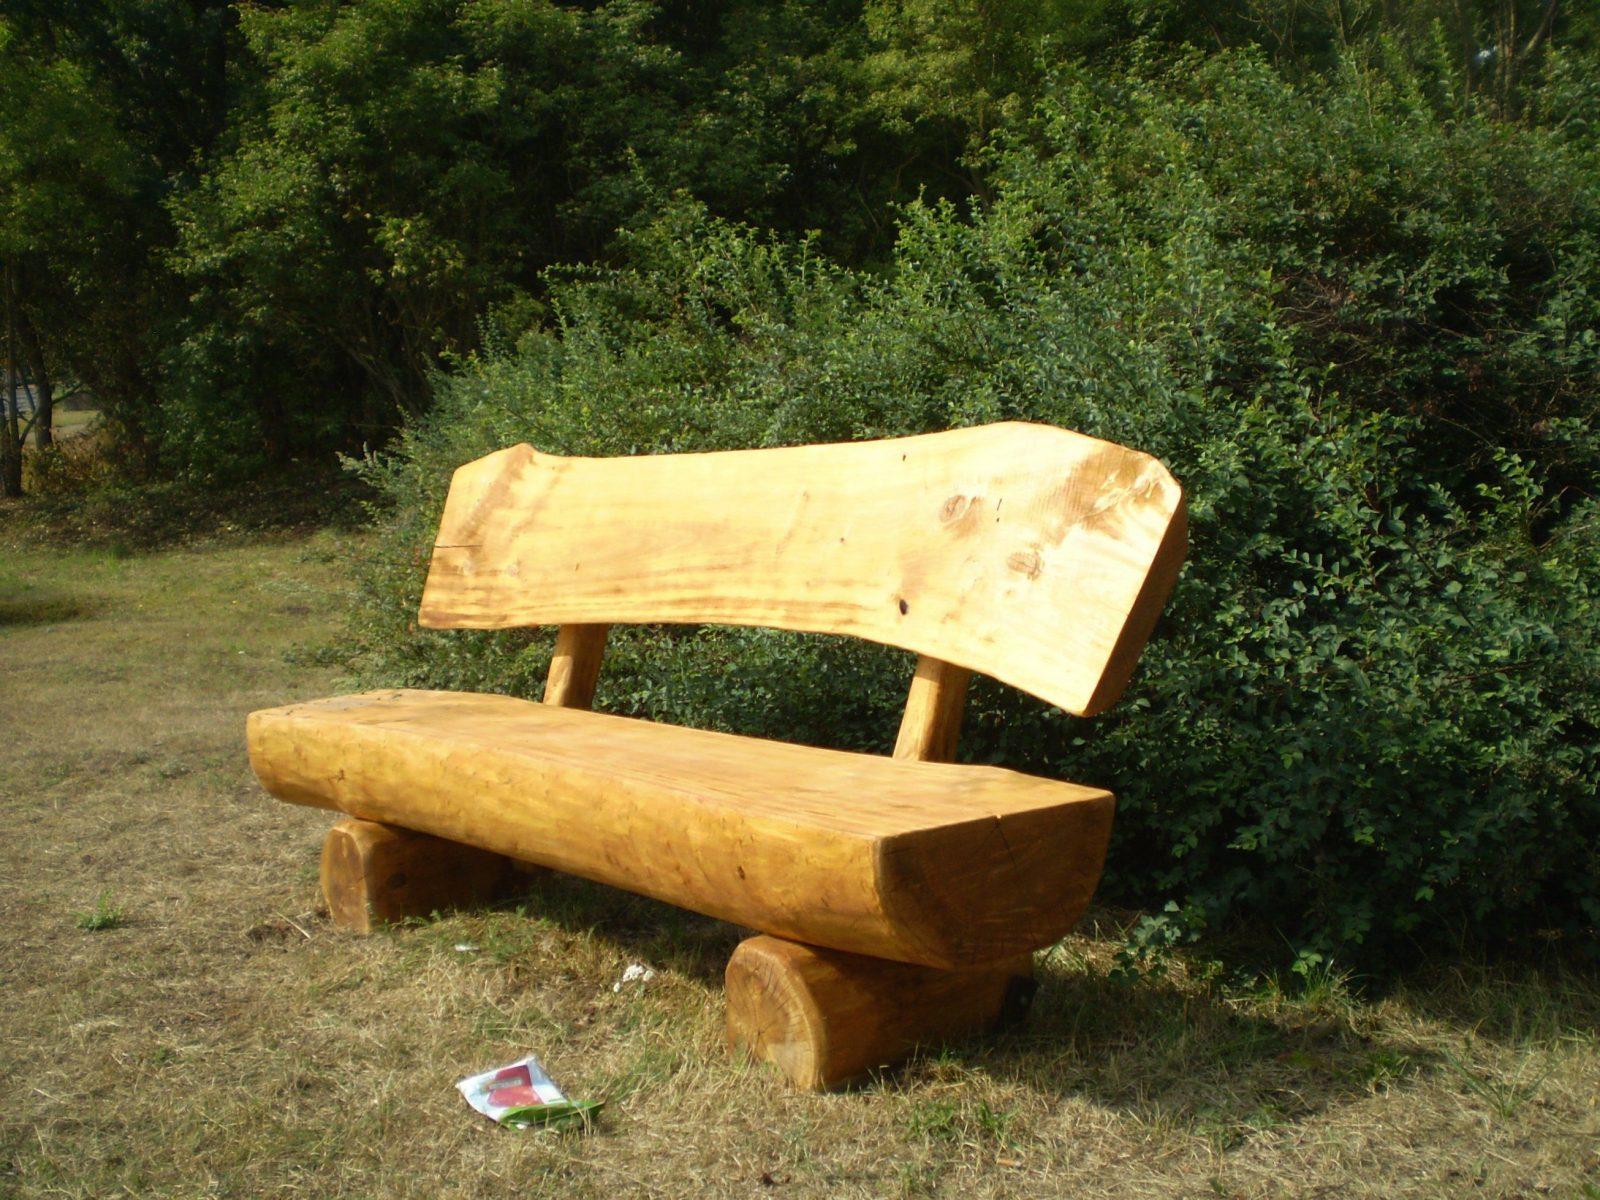 Holzbank Selber Bauen Rustikal Mit Rustikale Gartenmöbel Aus von Rustikale Gartenmöbel Selber Bauen Bild